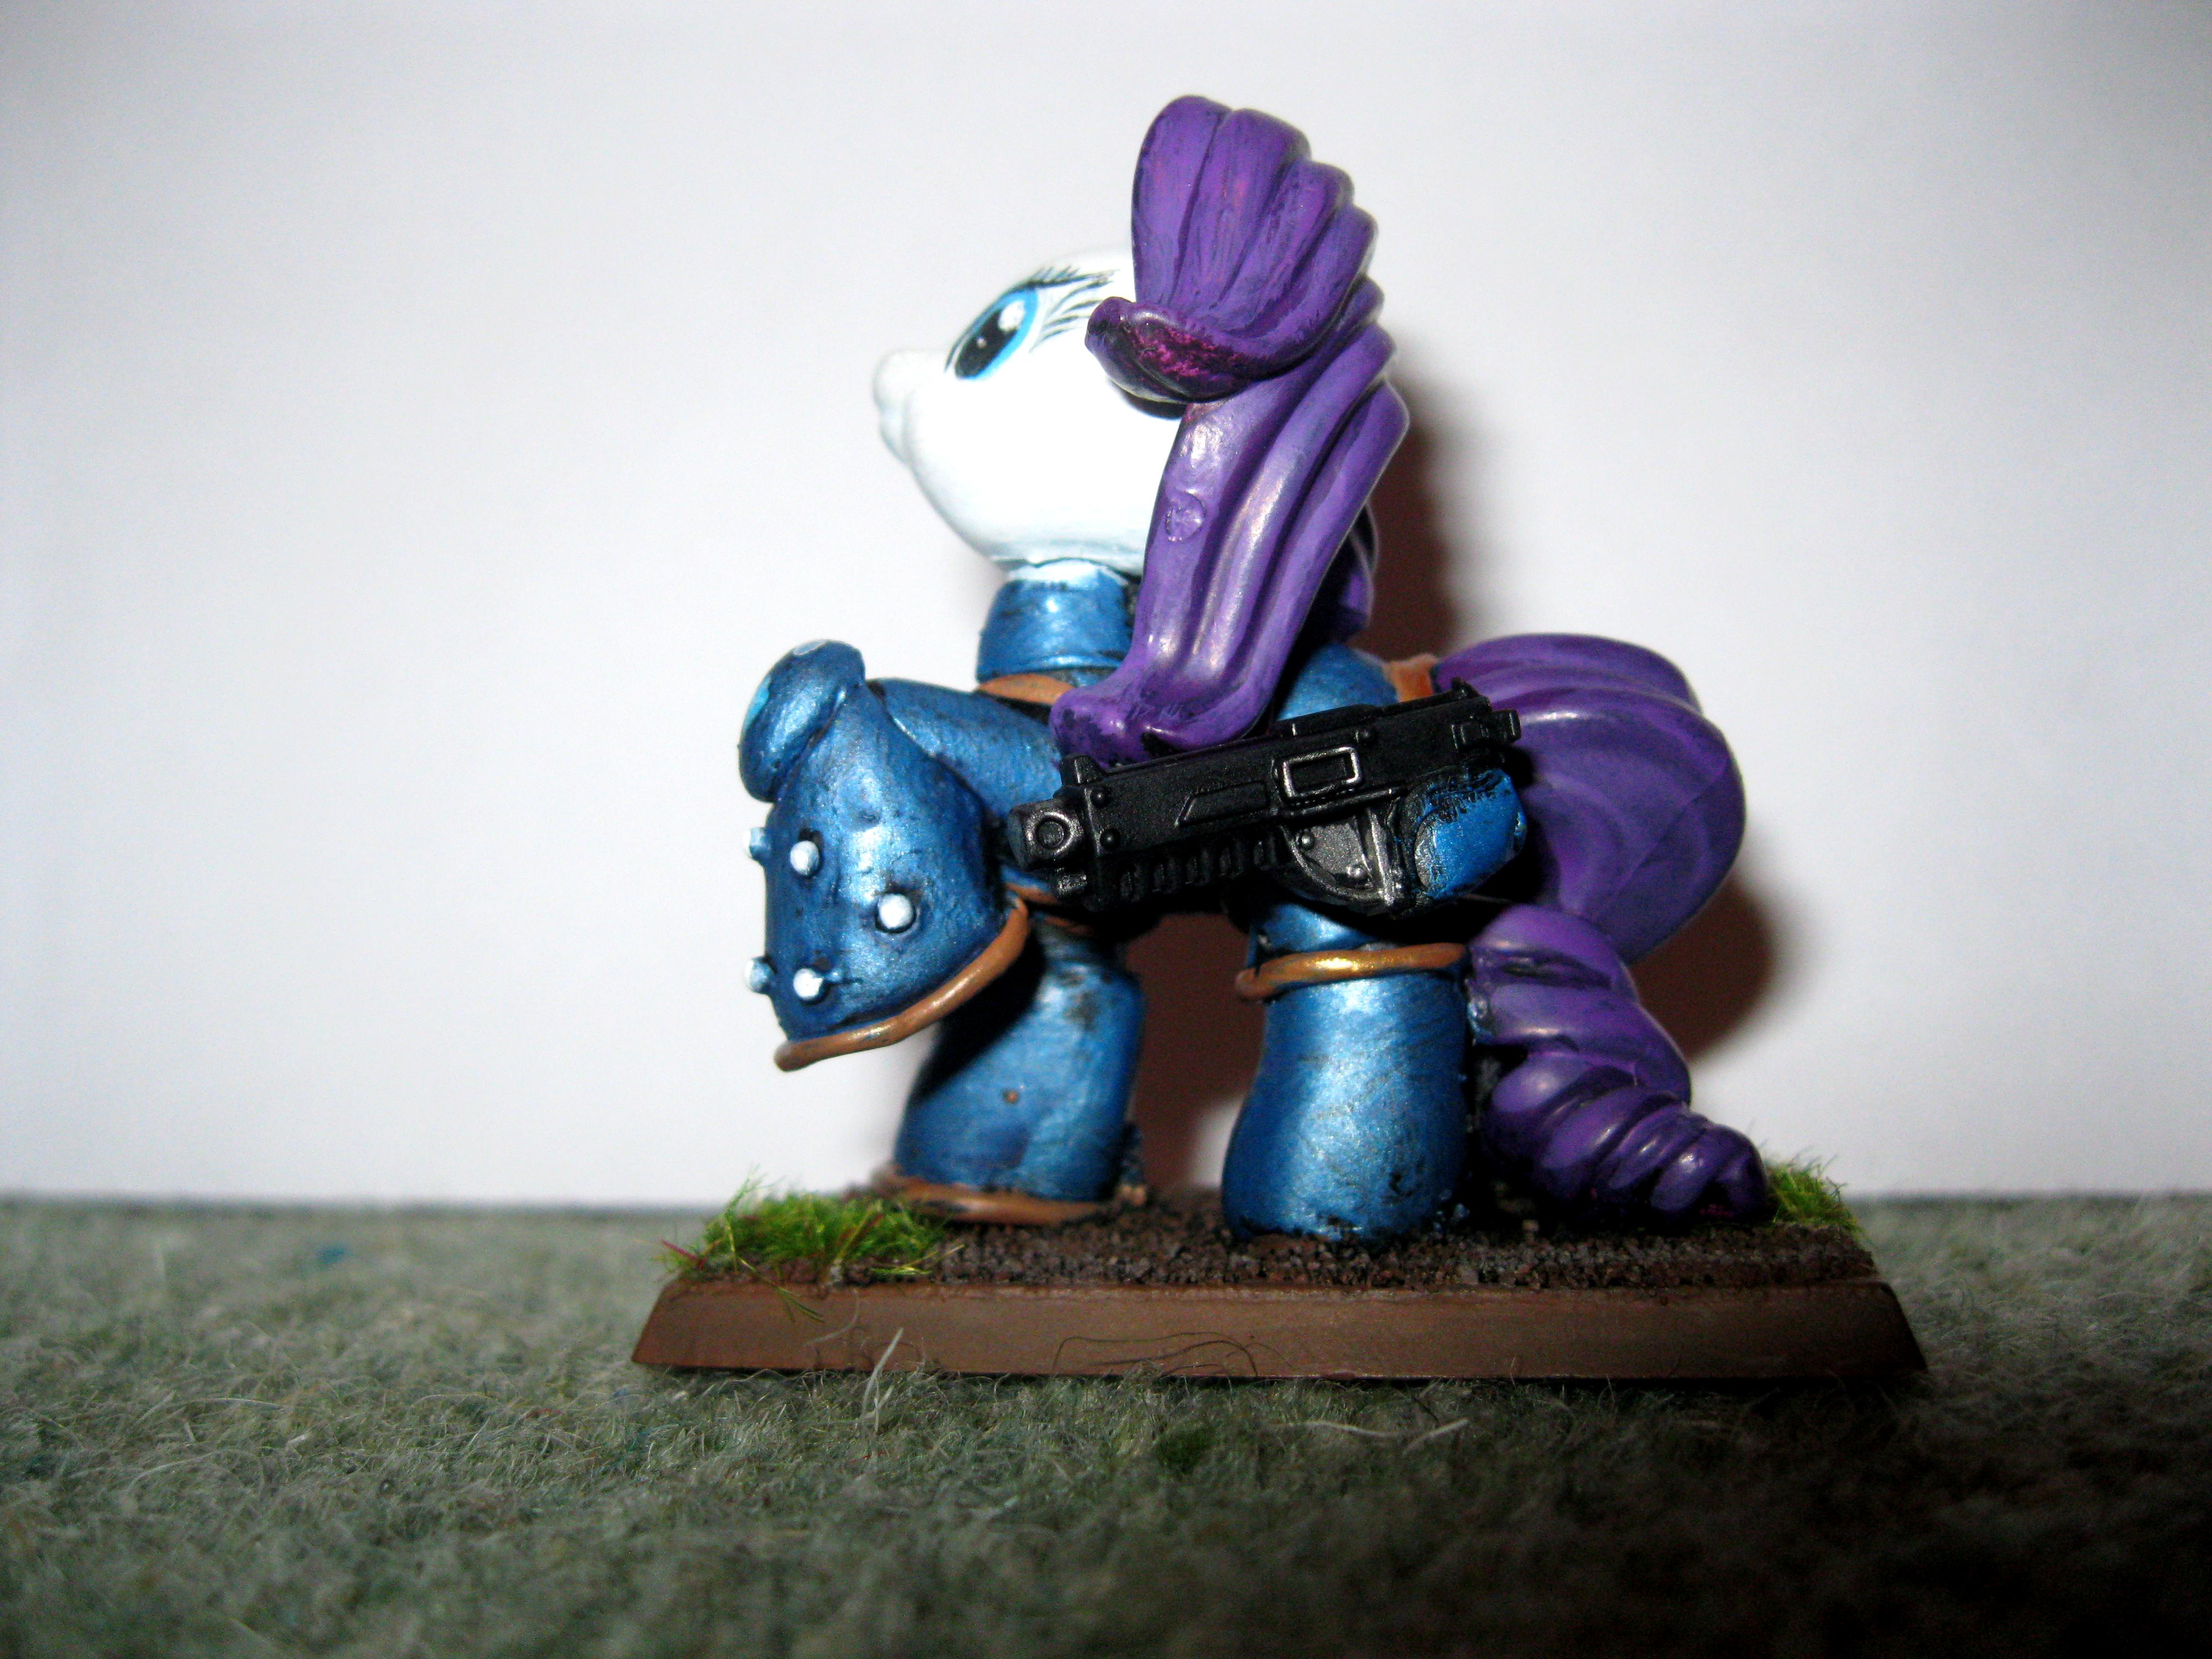 My Little Pony, Ponies, Rarity, Space Marines, Stupid, Ultramarines, Warhammer 40,000